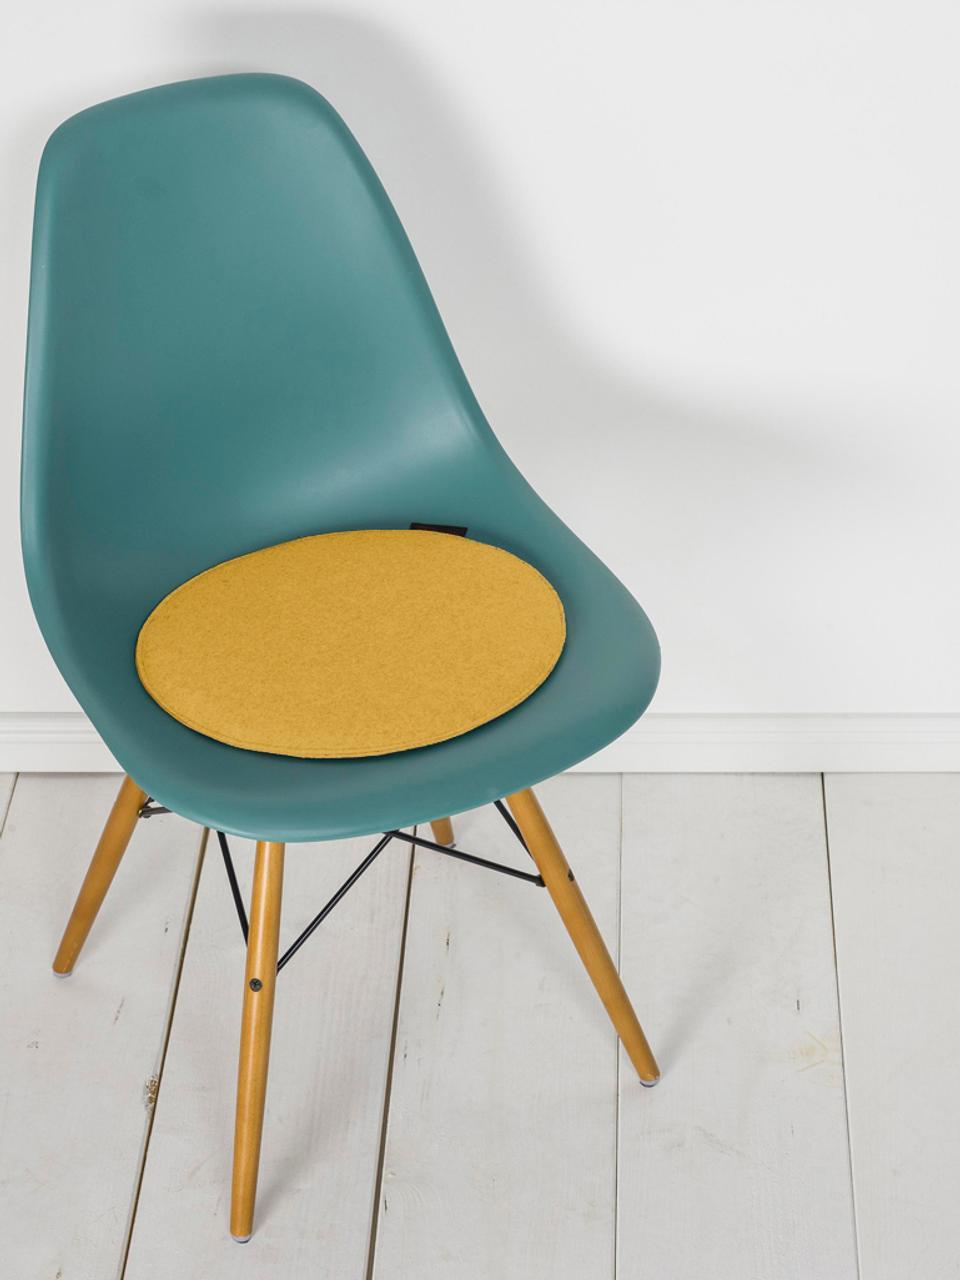 Cuscino sedia rotondo Avaro 4 pz, Ocra, Ø 35 x Alt. 1 cm